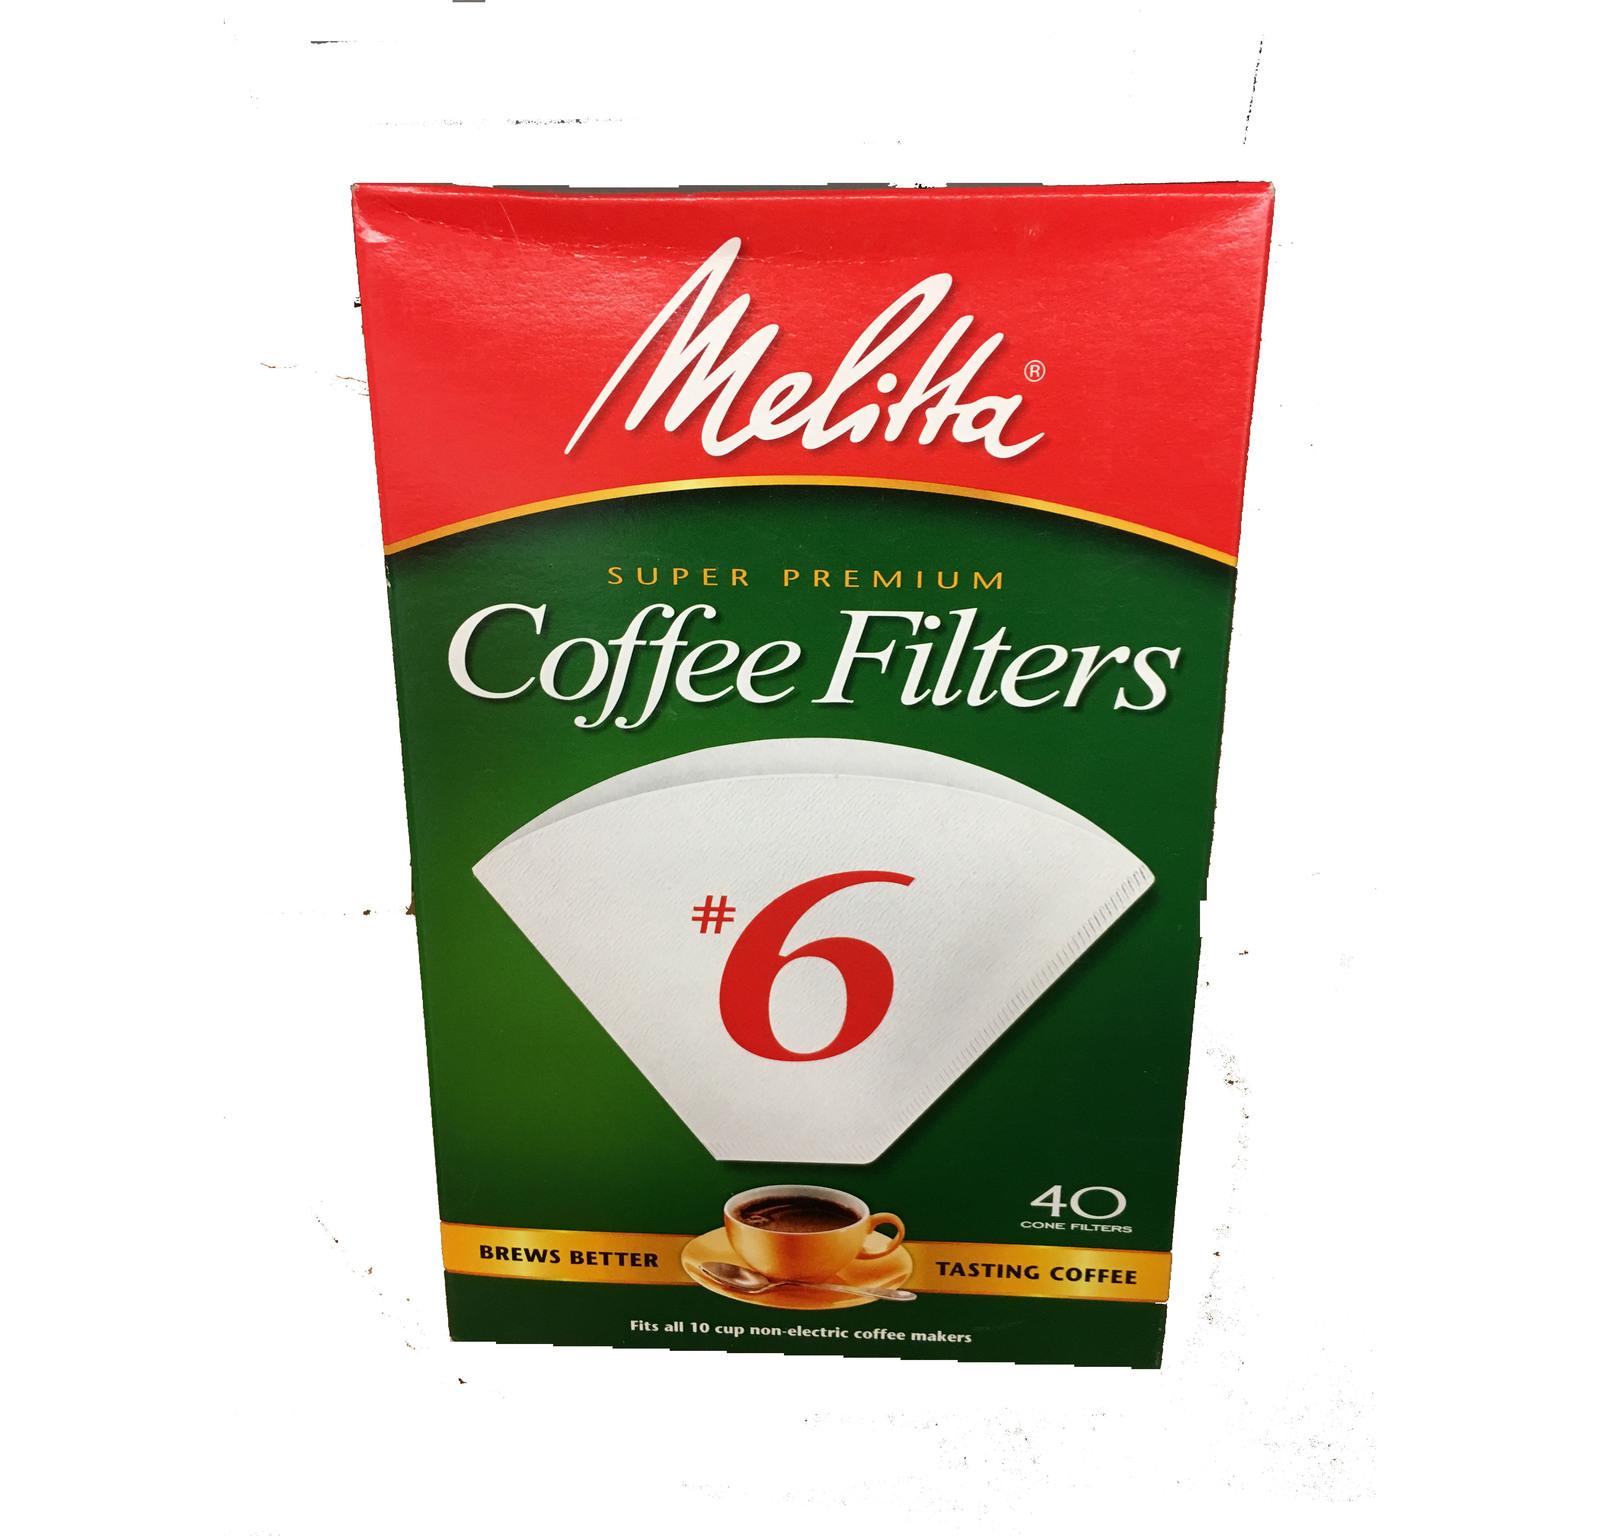 MELITTA SUPER PREMIUM COFFEE FILTERS # 6 OR # 1 - 40 CONE FILTERS BREWS BETTER T - $6.17